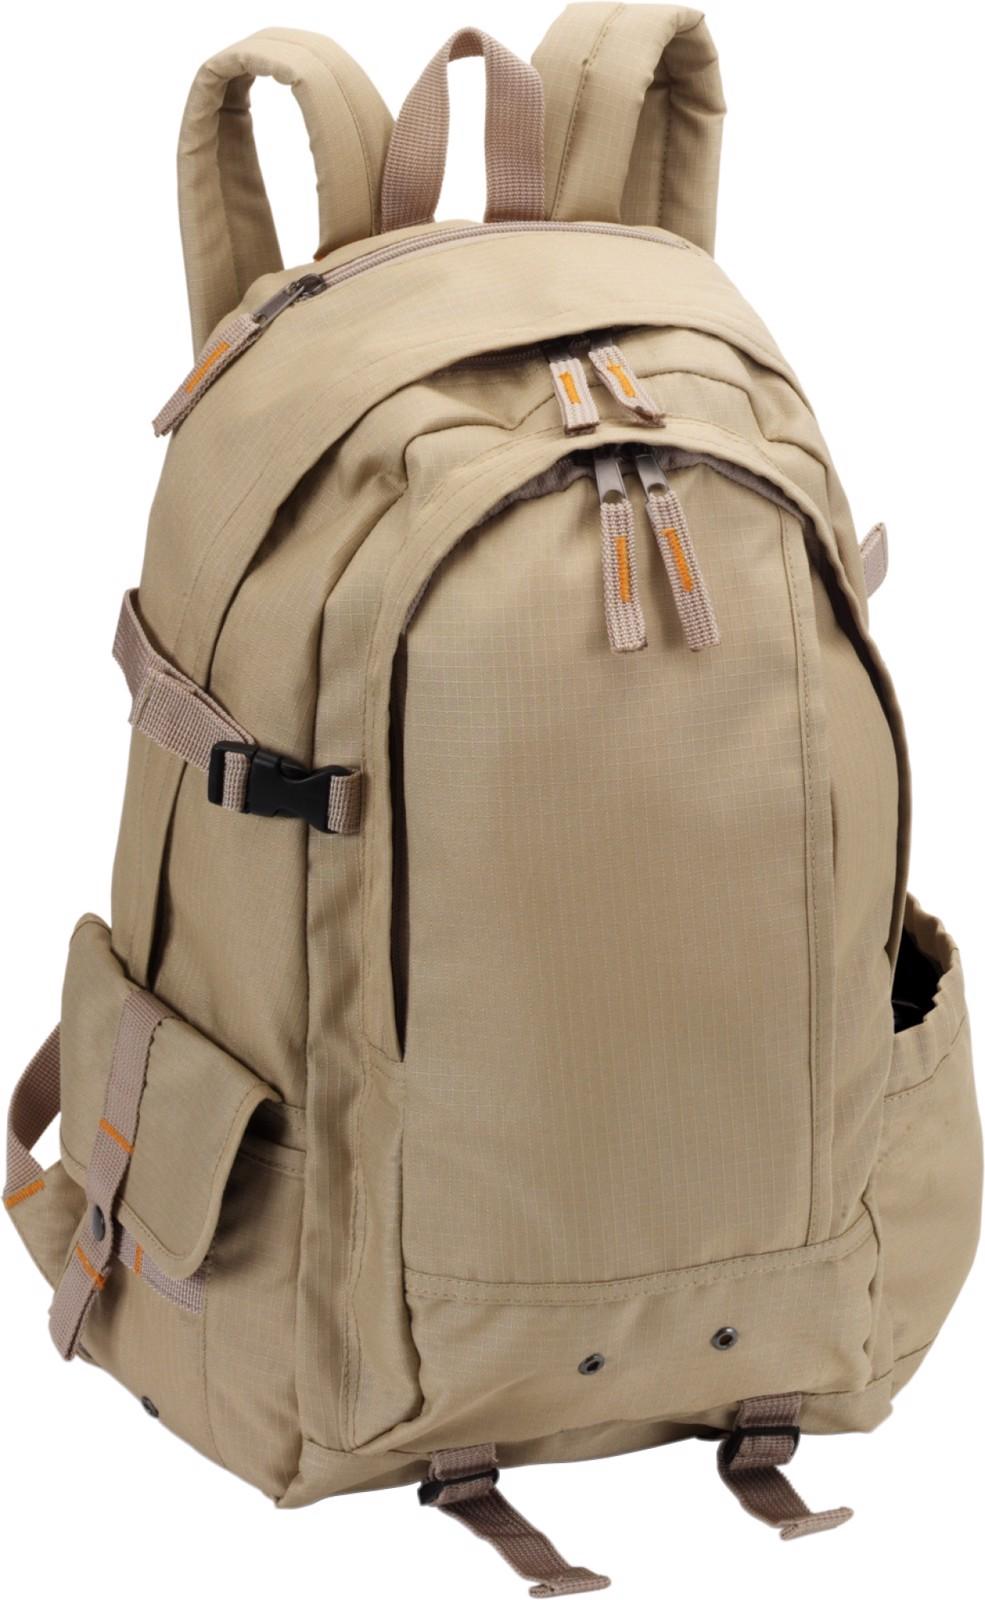 Ripstop (210D) backpack - Khaki